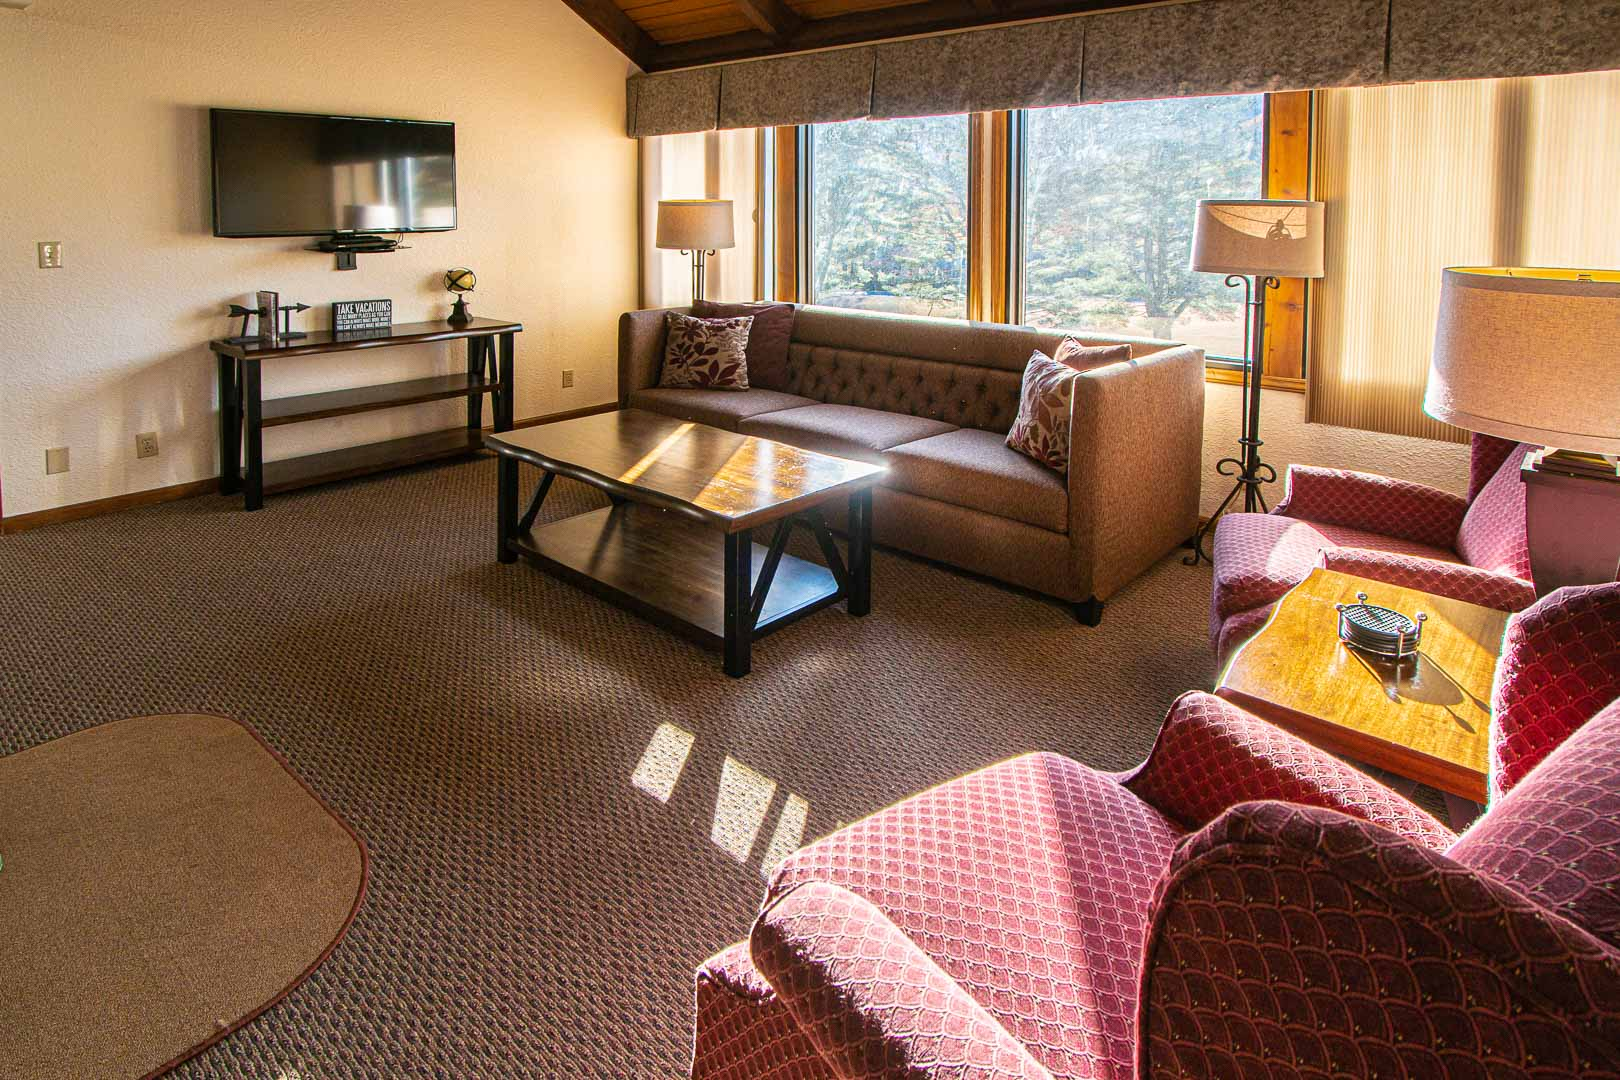 A spacious living room area at VRI's Mountain Loft Resort in North Carolina.